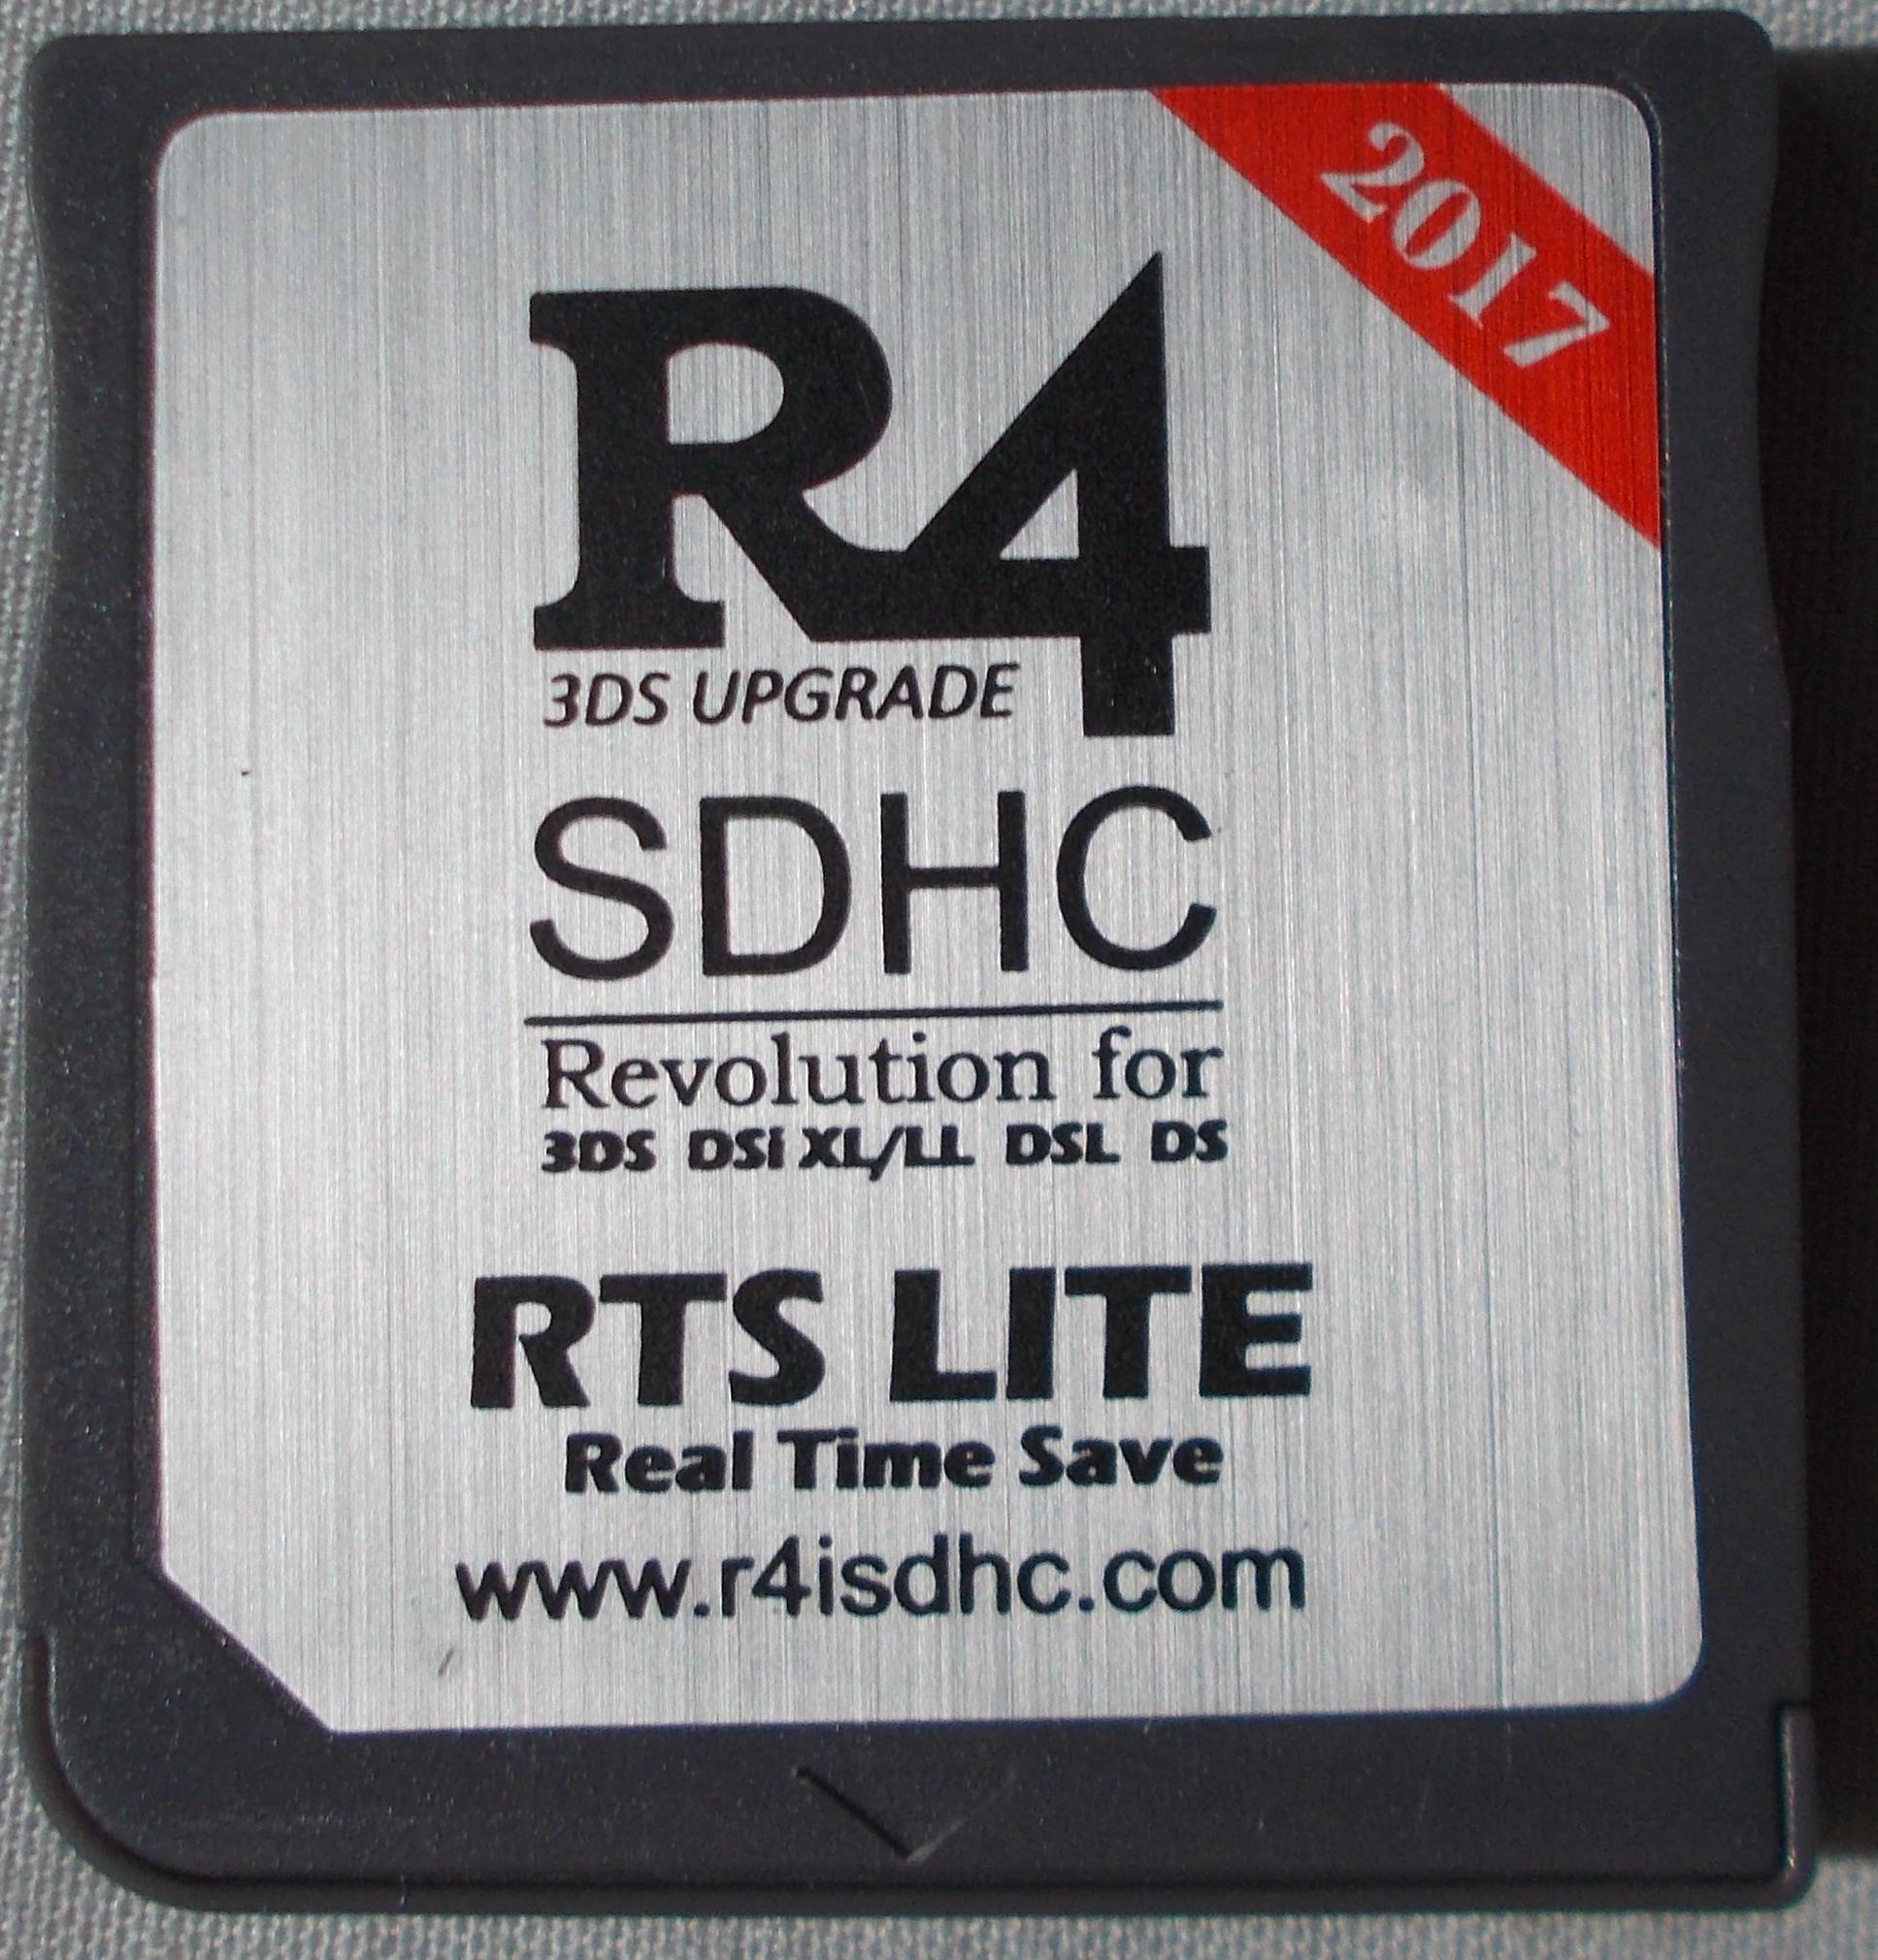 R4i Gold (R4iSDHC com Family) · Issue #11 · ntrteam/flashcart_core